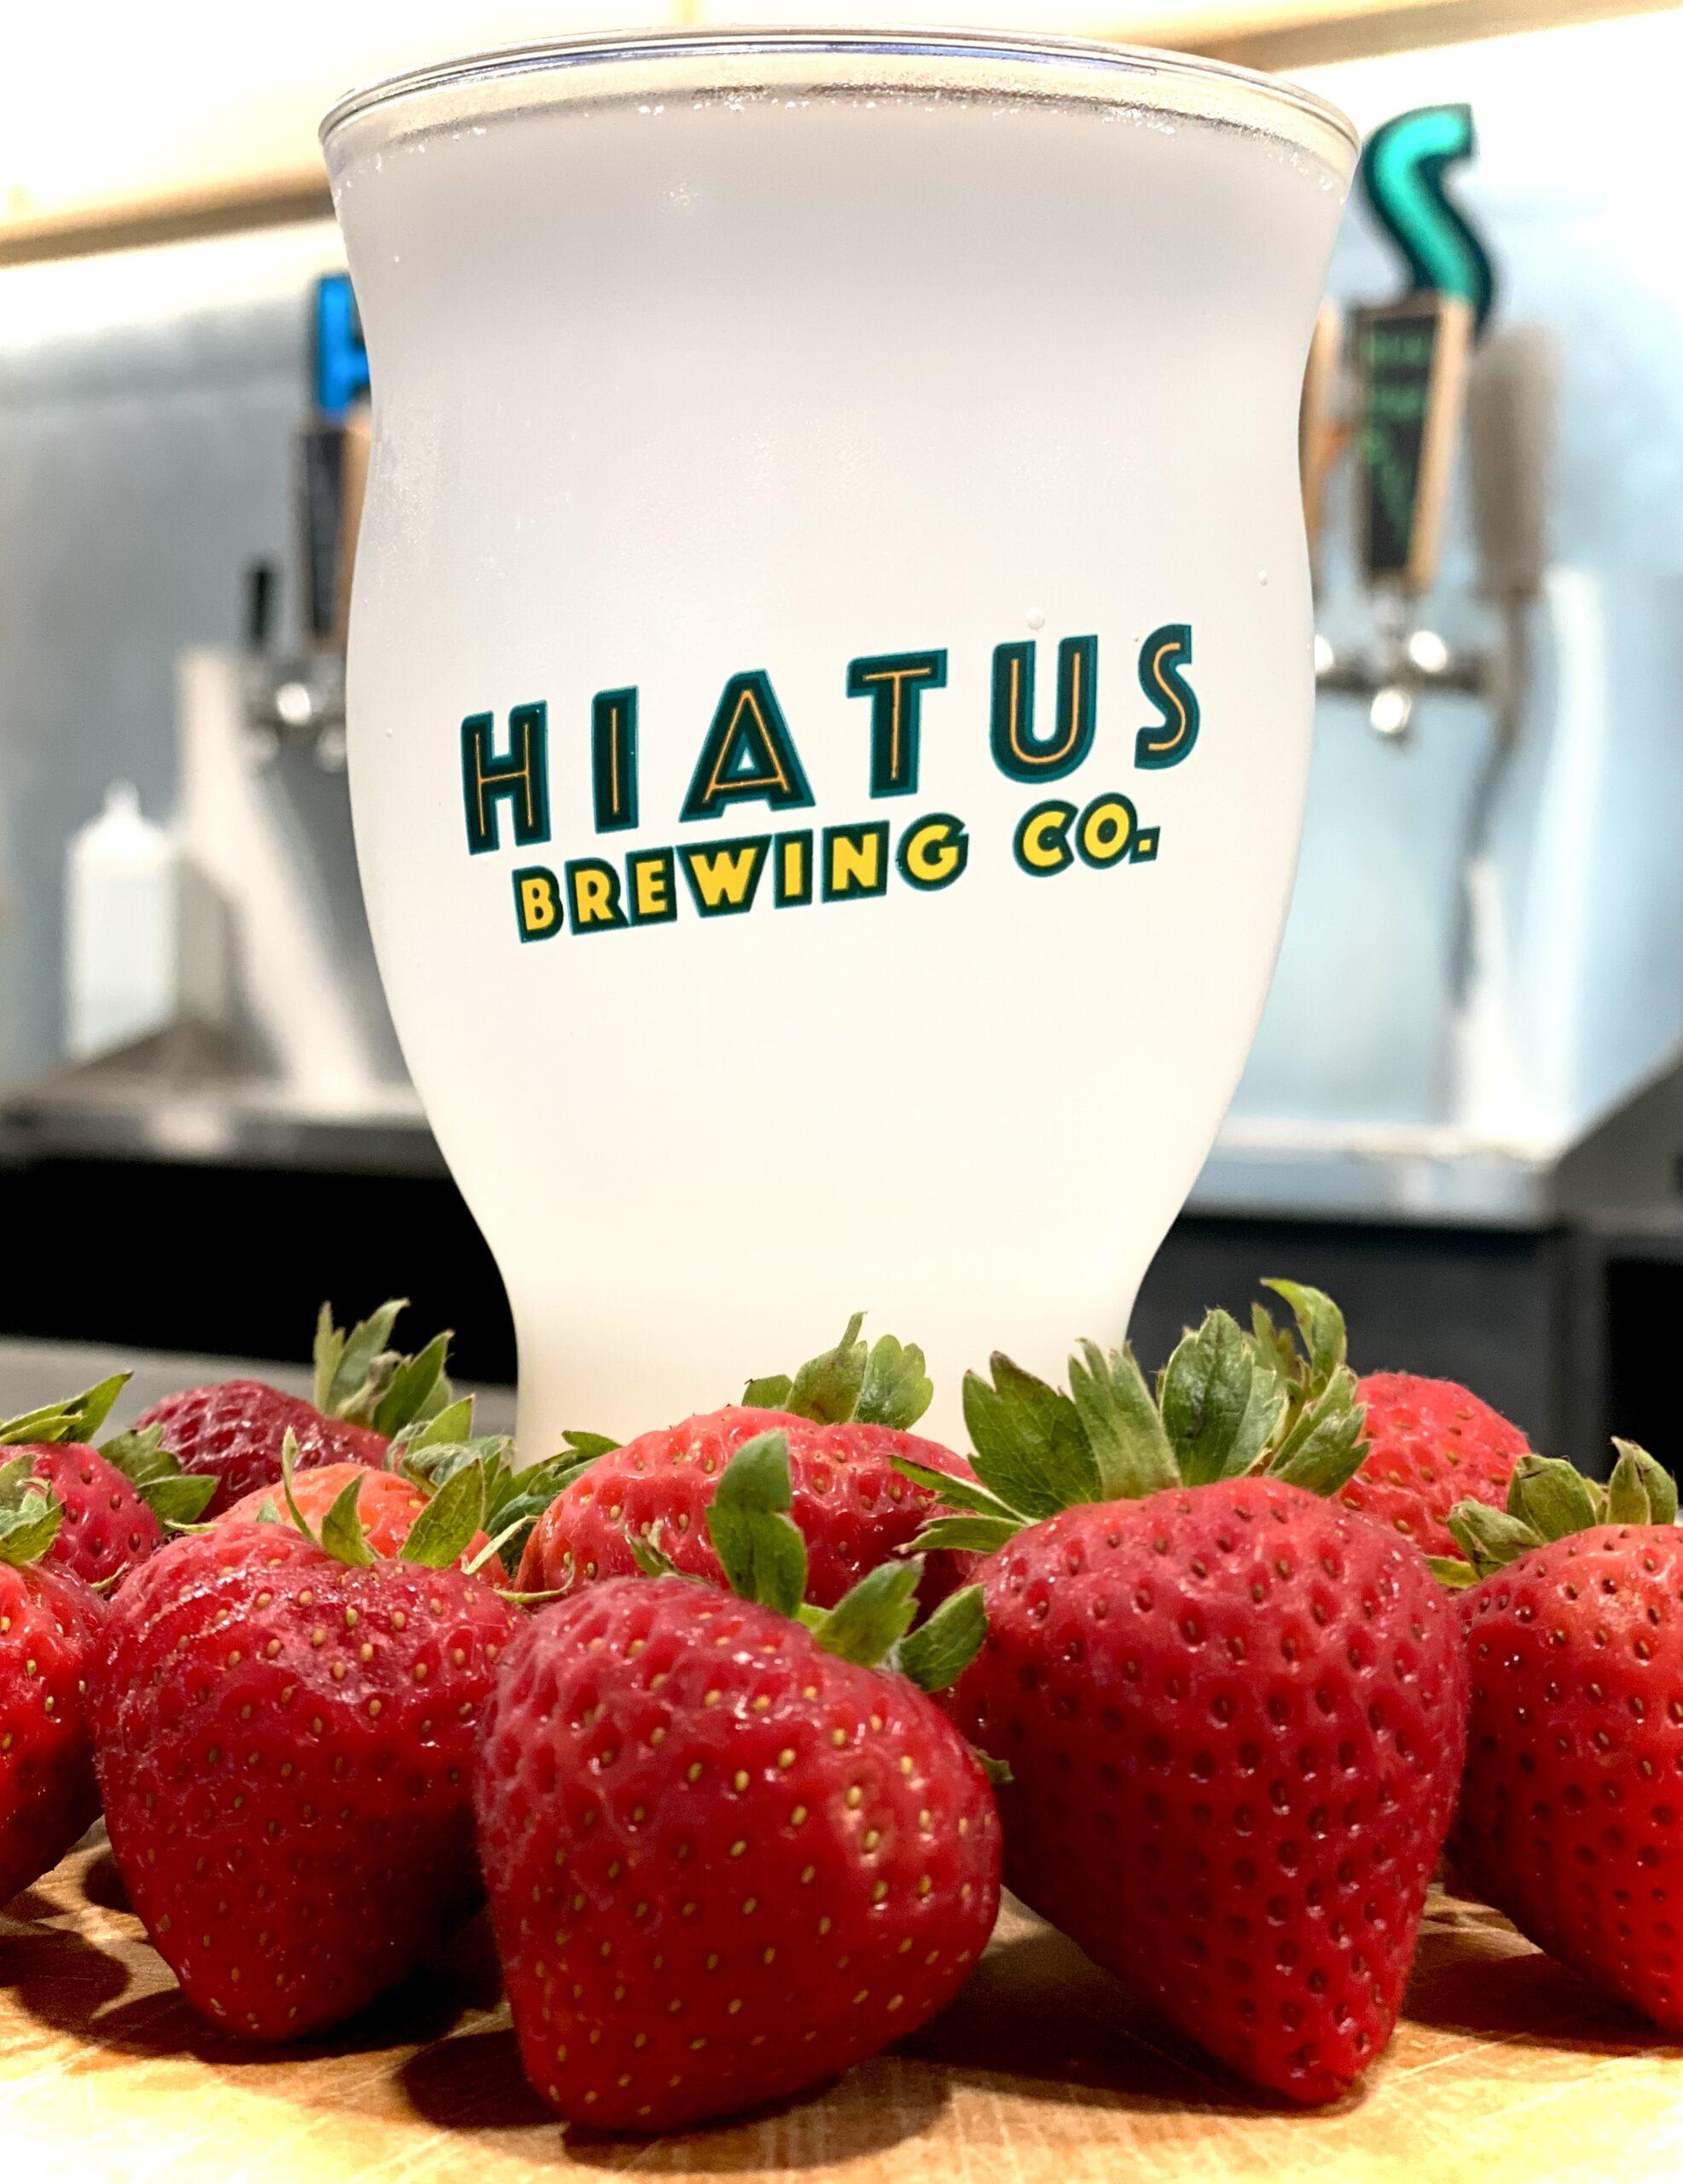 Hiatus Brewing Company Brew Pub Ocala Florida Brewery Craft Beer CBD Seltzer Non Alcoholic